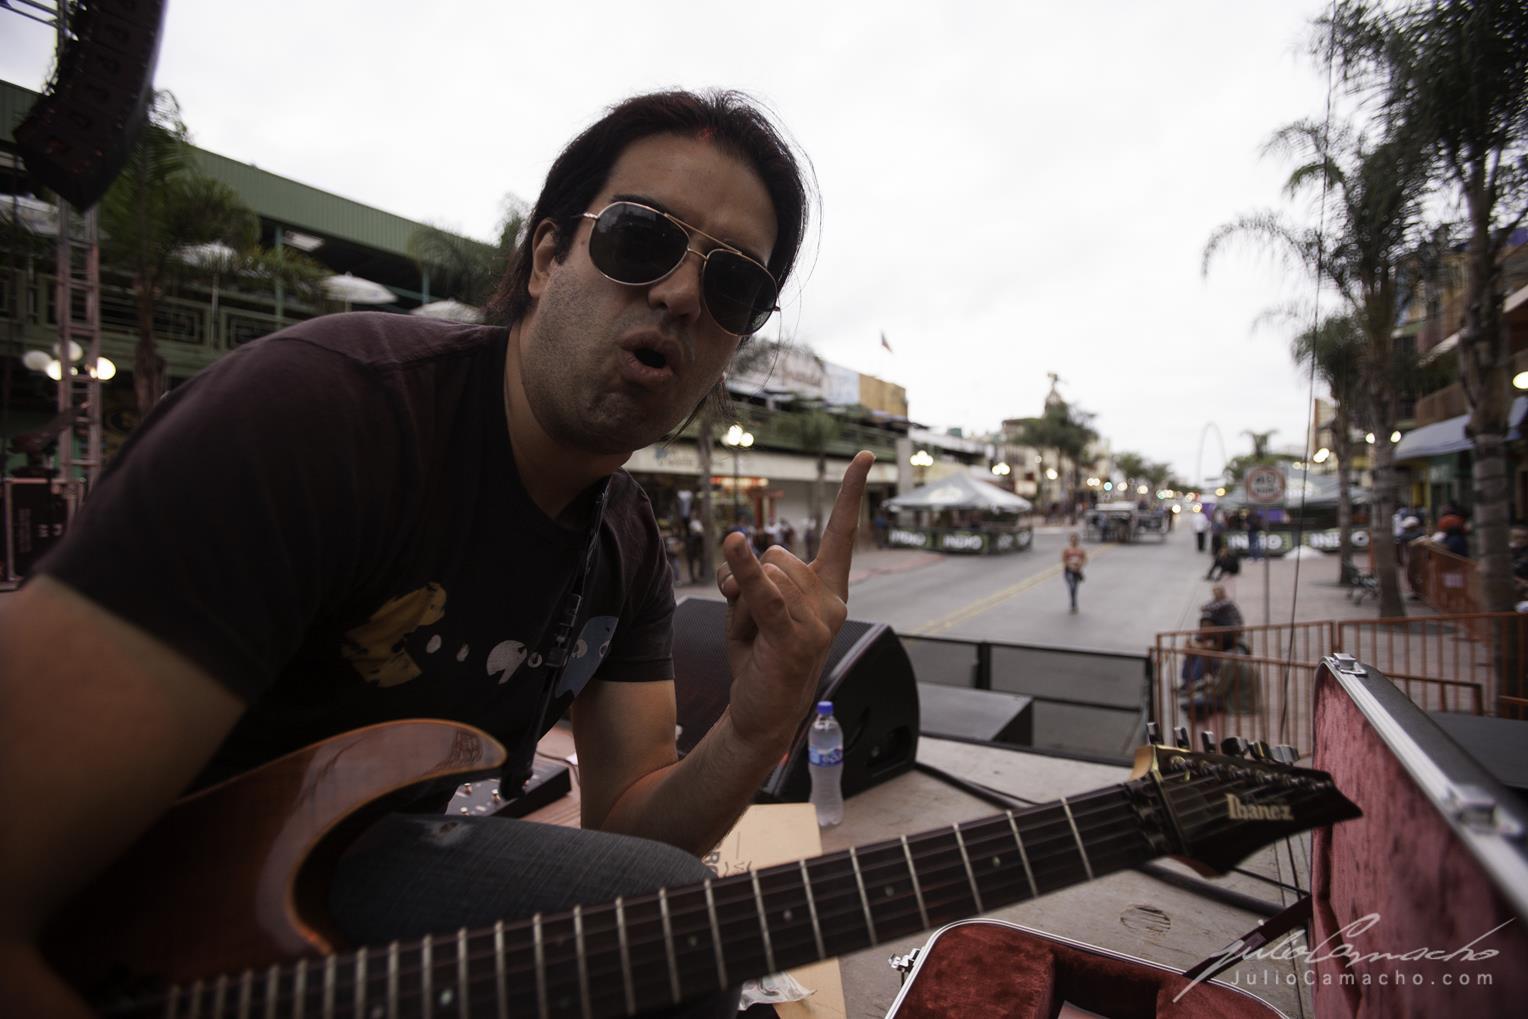 2014-10-30 31 CAST TOUR Ensenada y Tijuana - 1317 - www.Juli (Copy).jpg